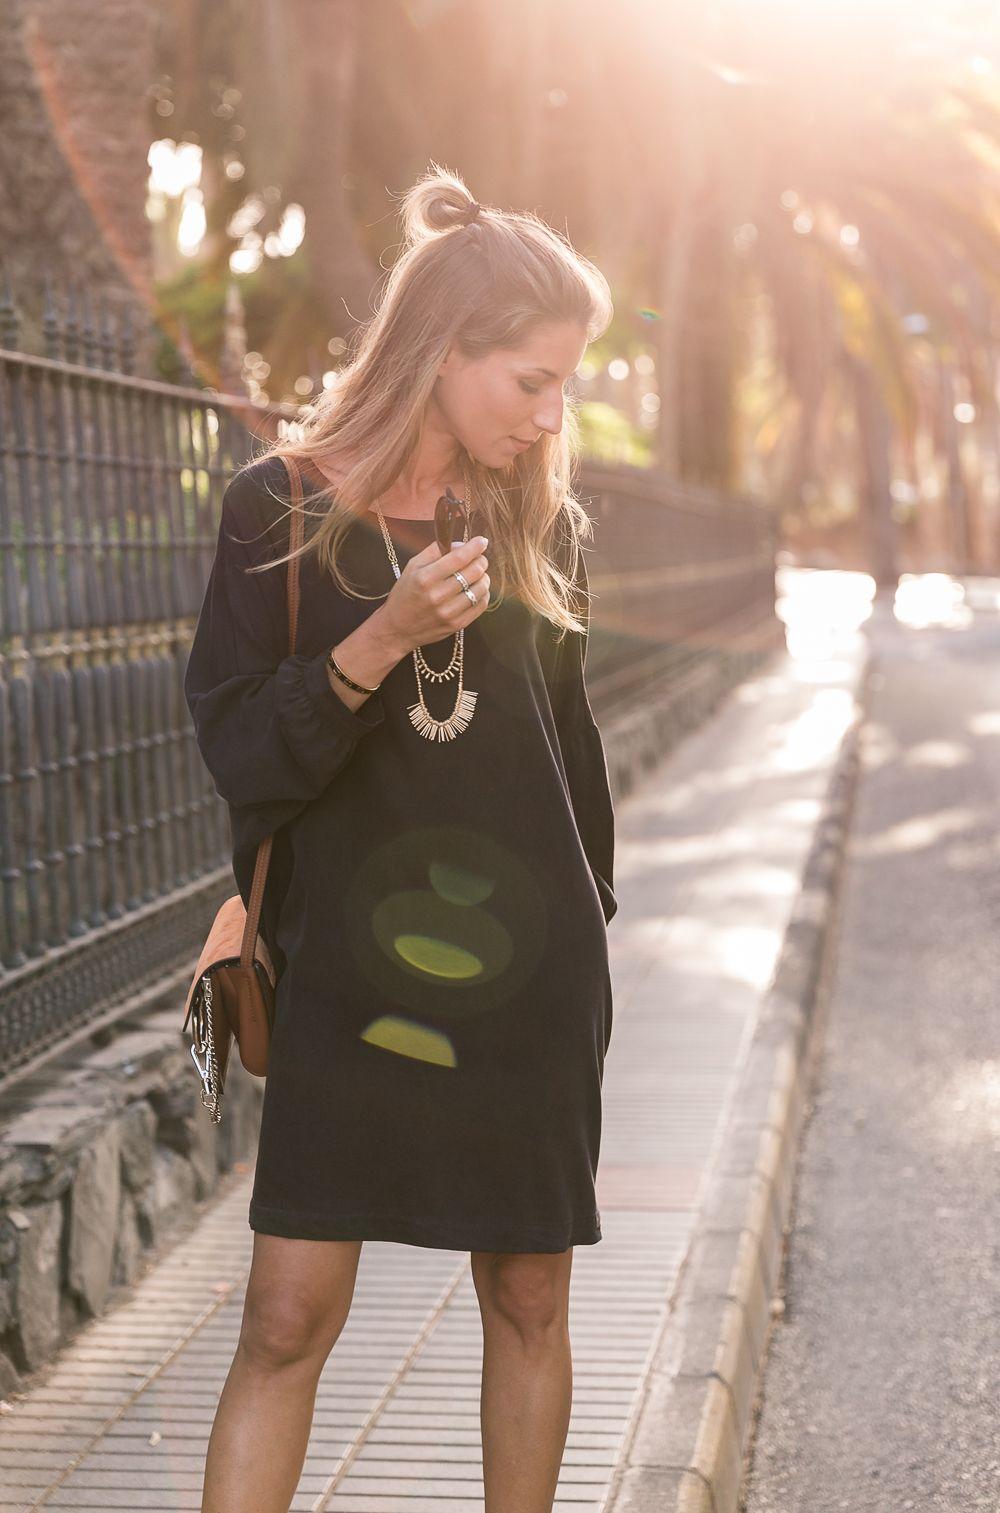 black dress american vintage summer outfit fashion blog platform sandals long necklace brown bag chloe chic style